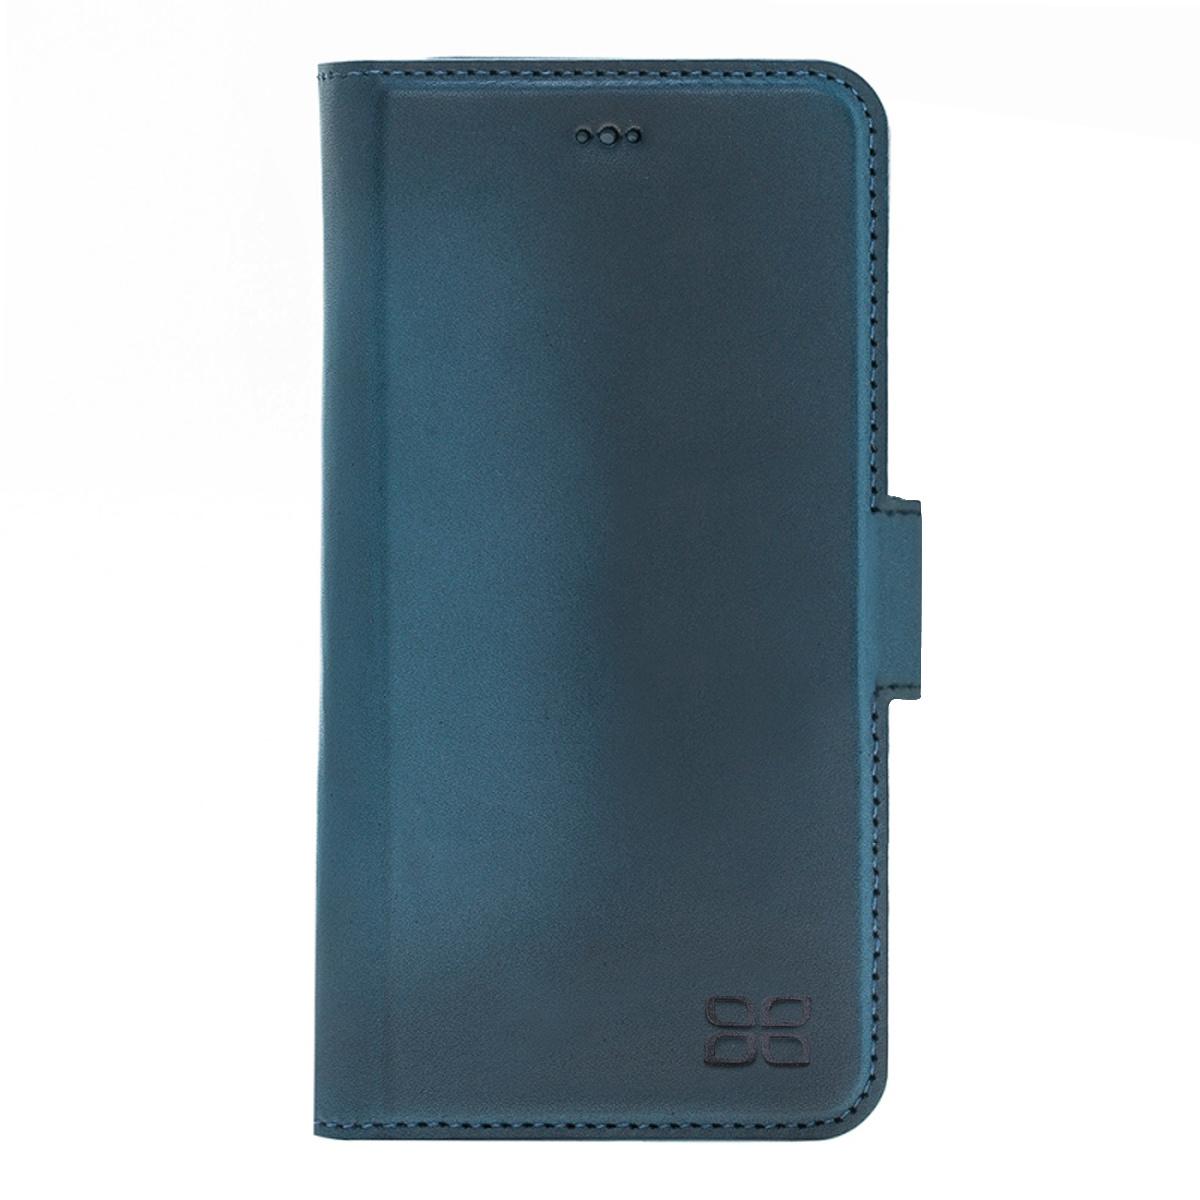 Bouletta Bouletta - Samsung Galaxy S10 Plus BookCase (Midnight Blue)